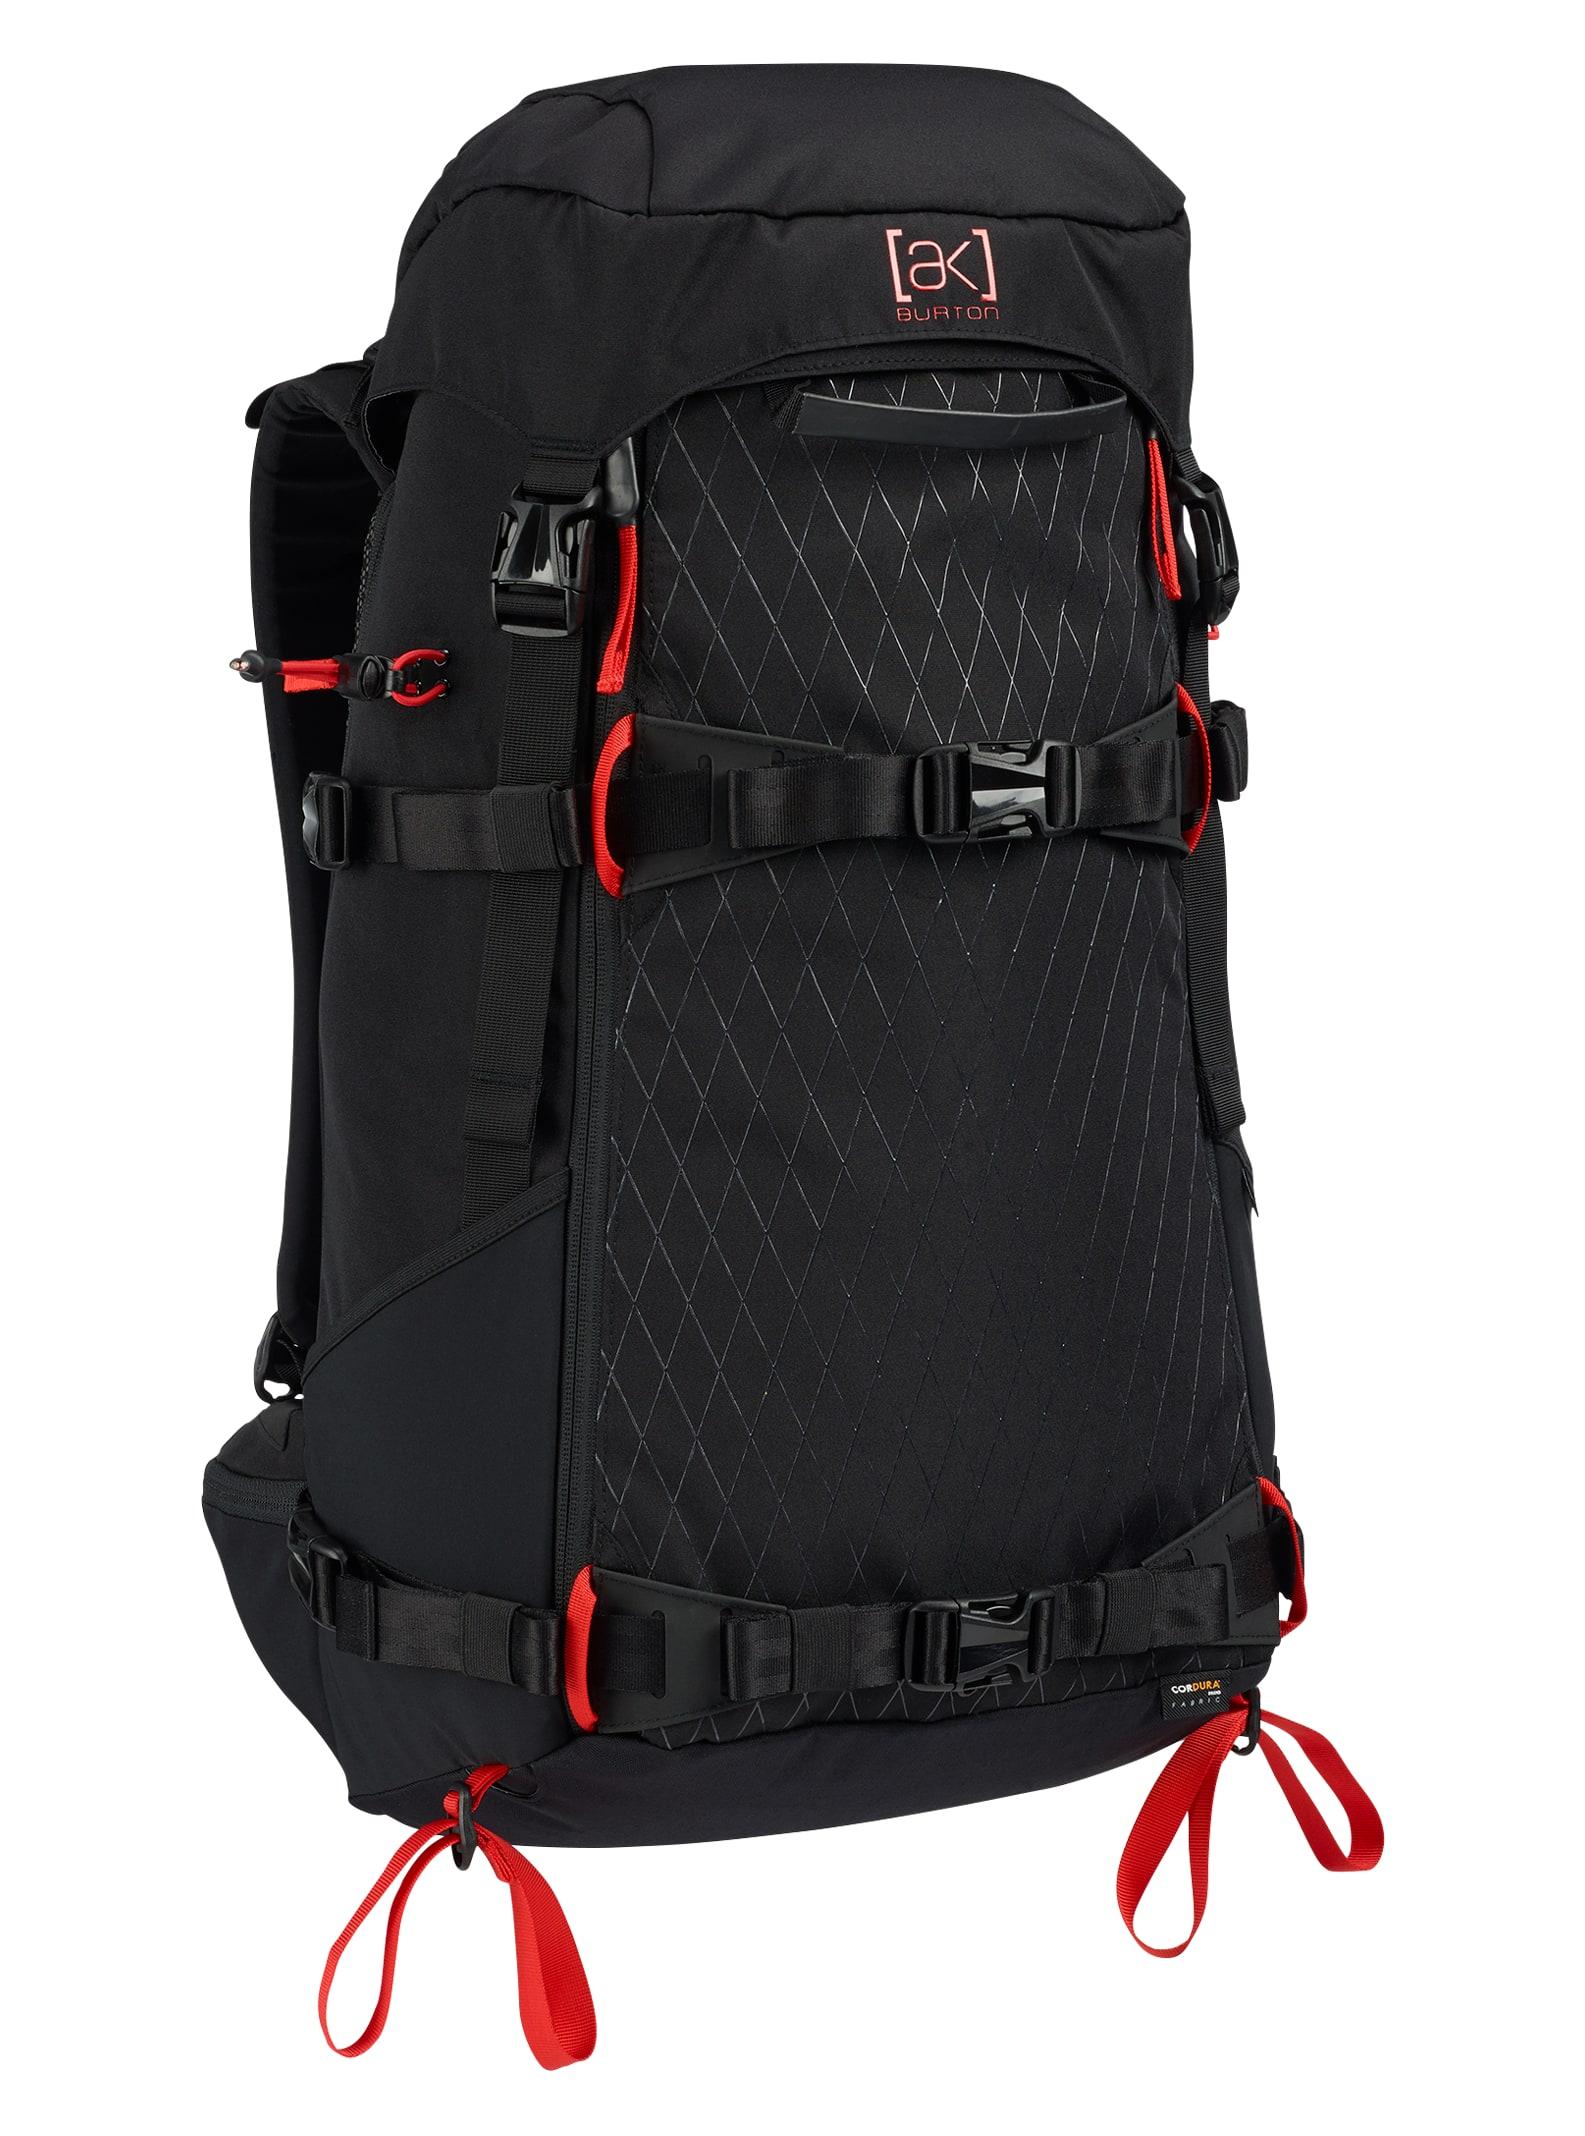 Burton [ak] Tour 33 L ryggsäck, Black Cordura�